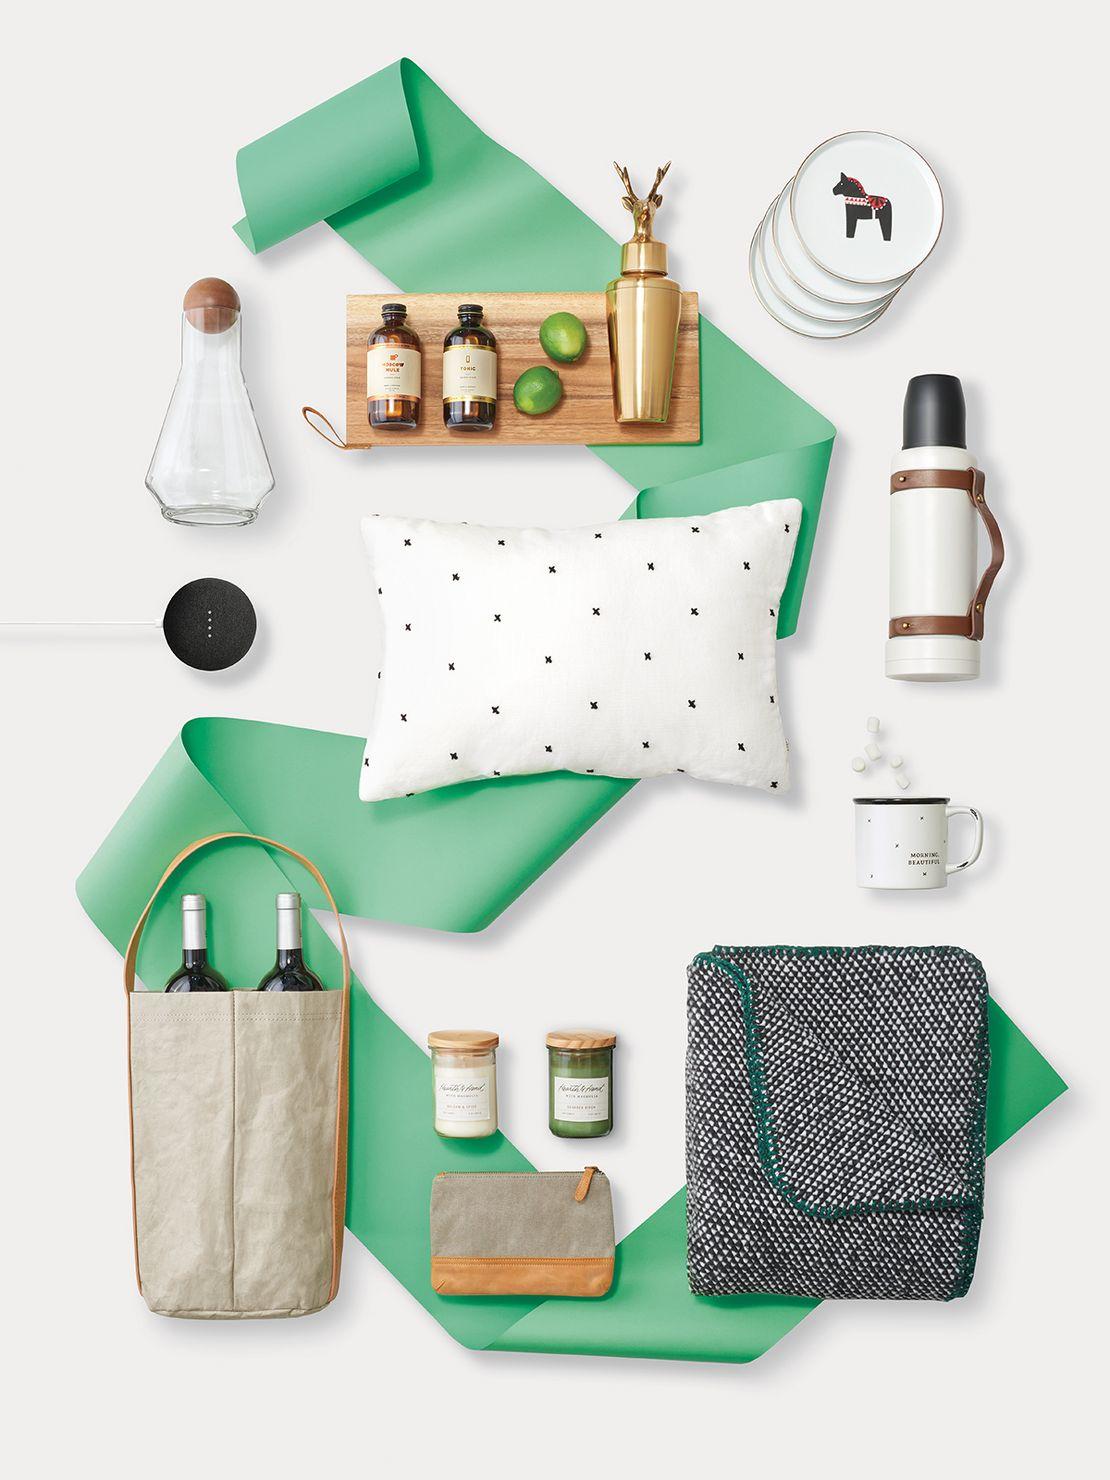 Home Furnishings Decor Target - Travel bag for bathroom items for bathroom decor ideas